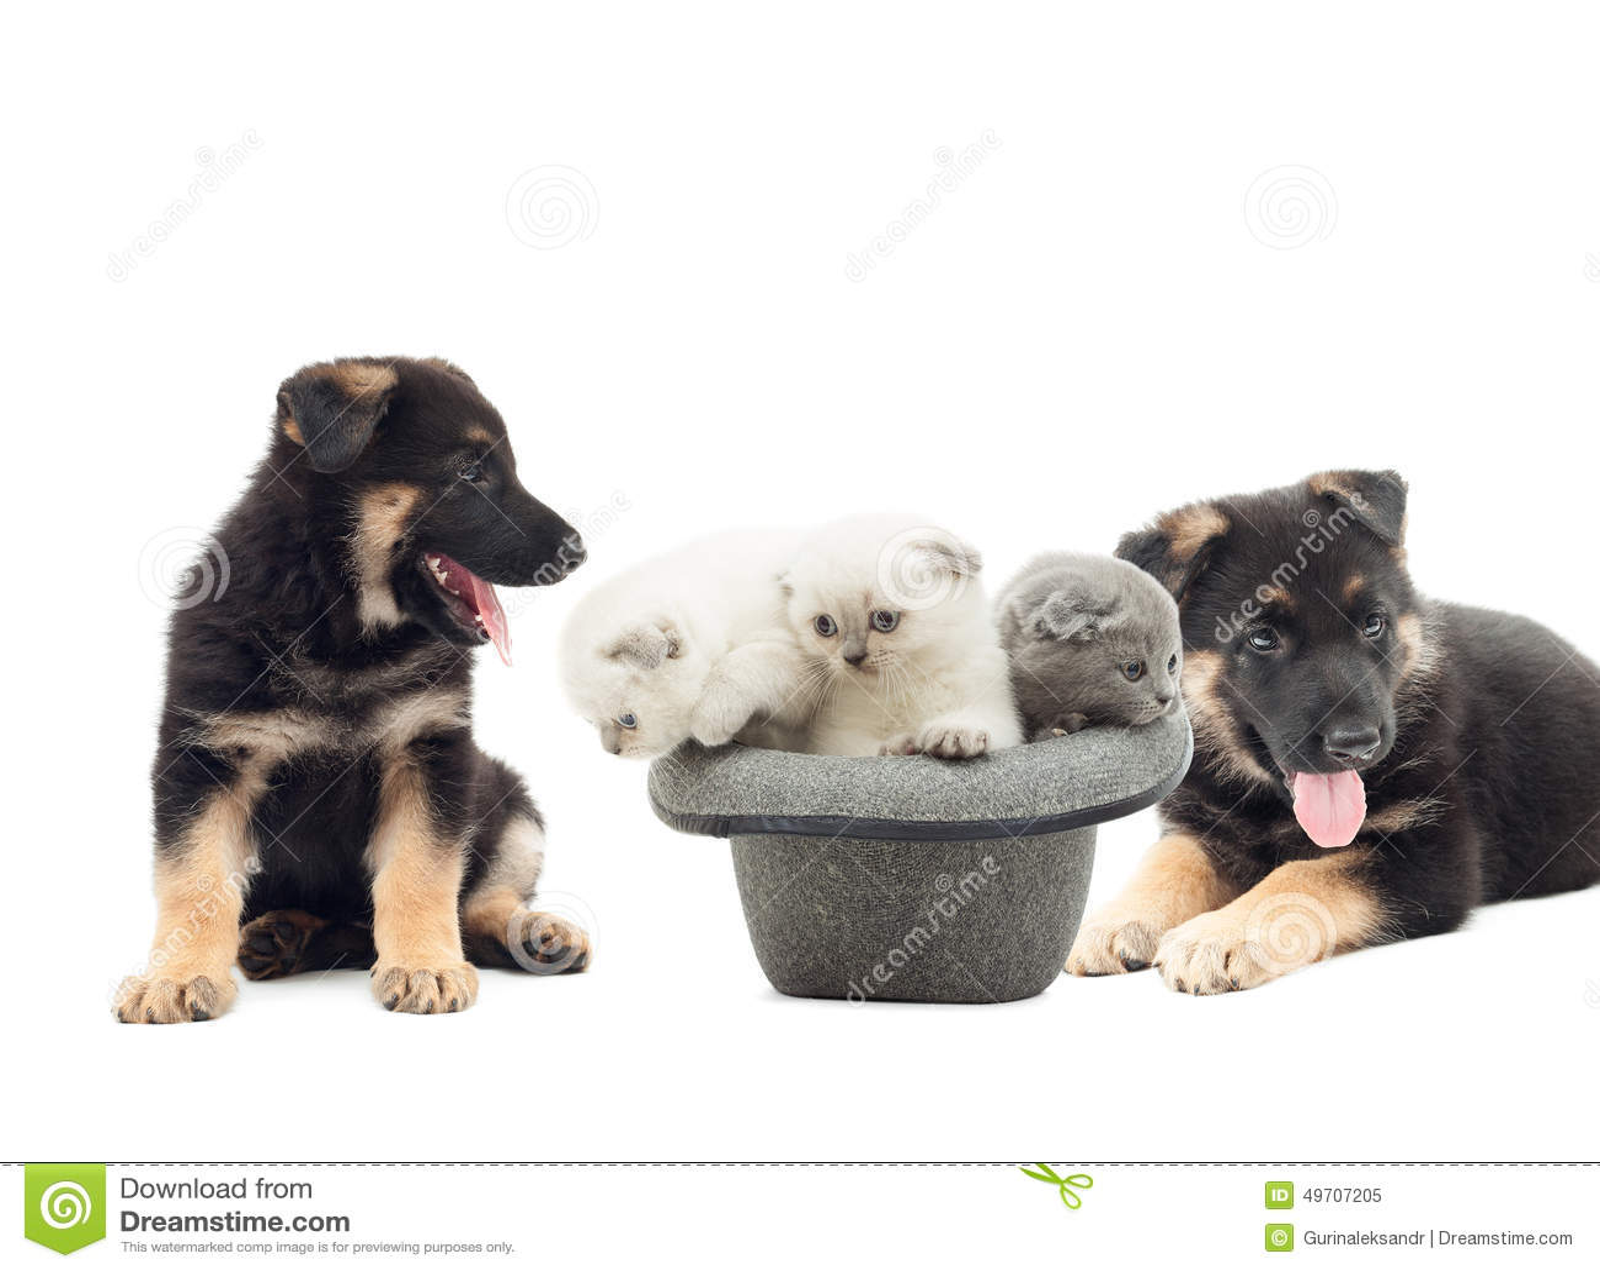 German Shepherd puppies and British Fold kittens